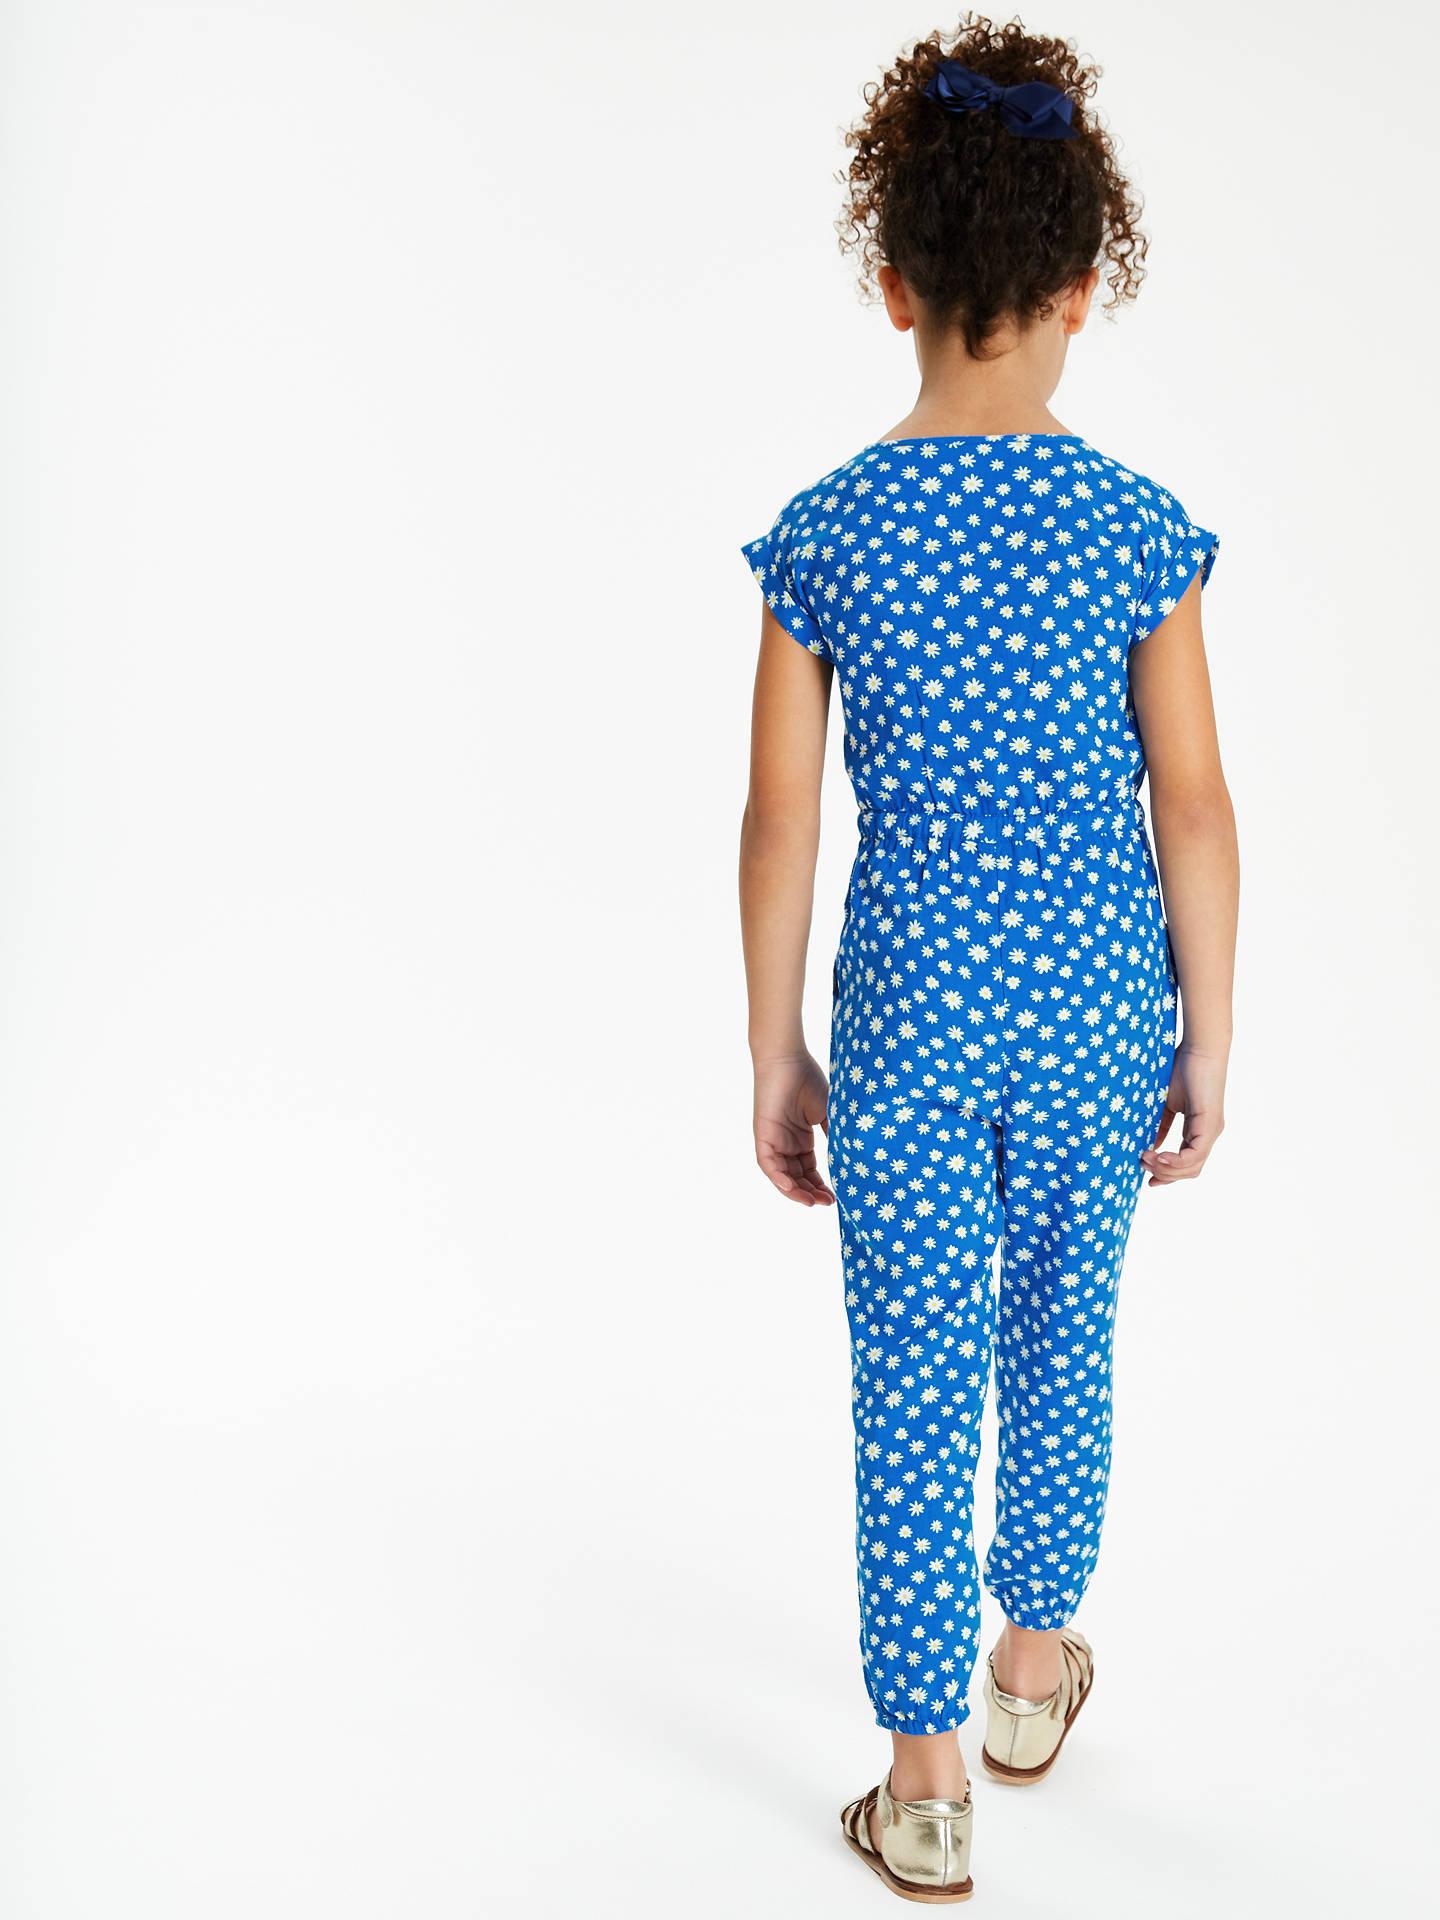 1db4607a0d8 ... Buy John Lewis   Partners Girls  Daisy Jumpsuit